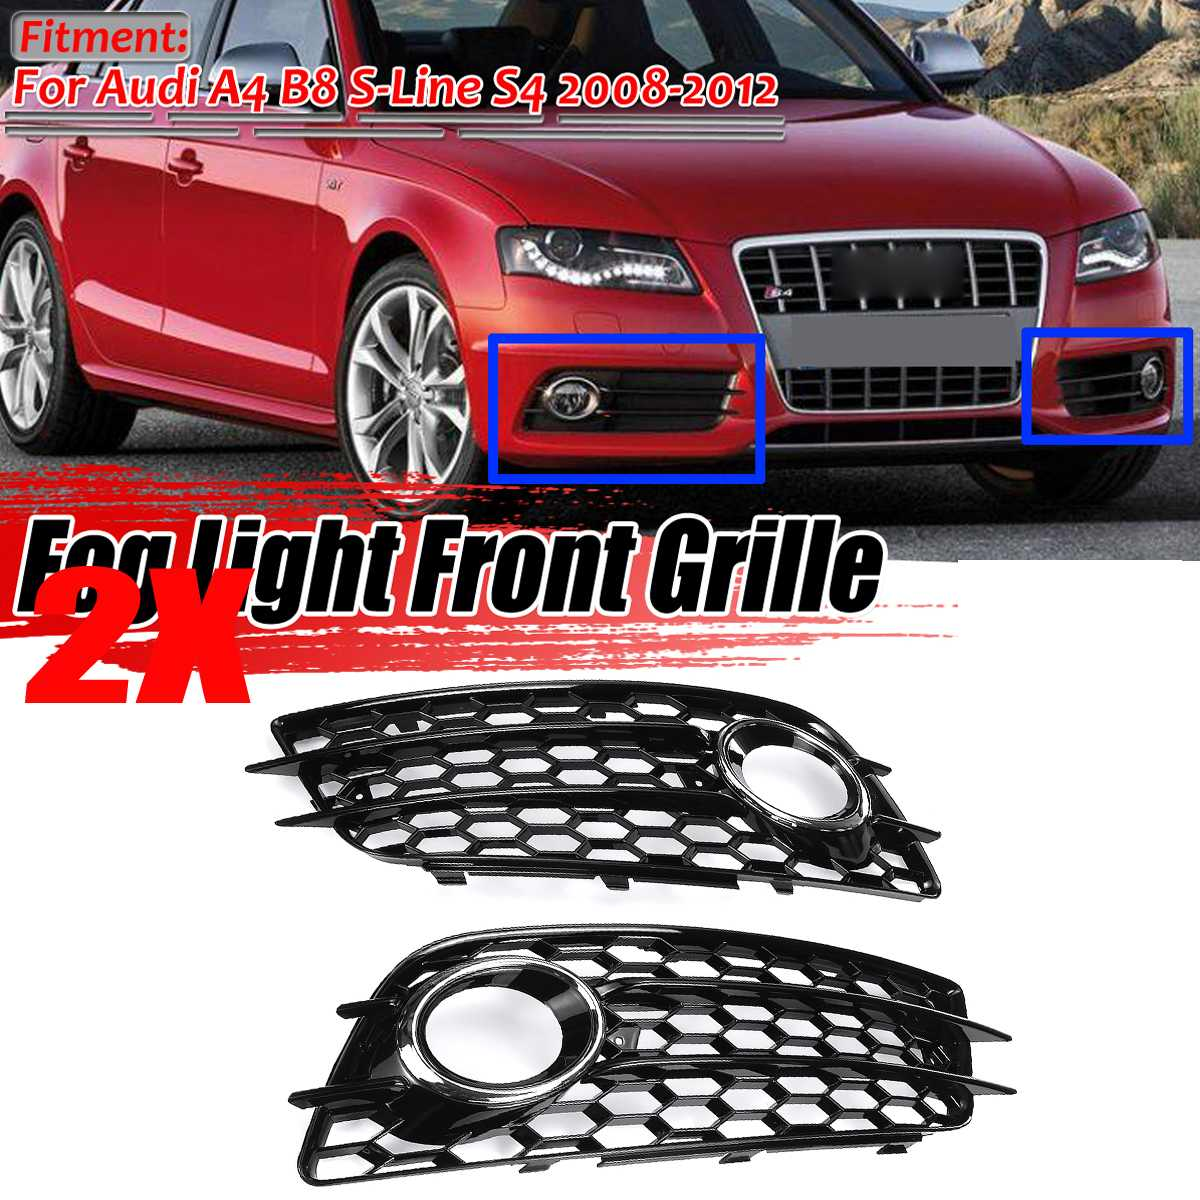 2PCS Car Front Fog Light Grille Cover Honeycomb Fog Lamp Grill For Audi A4 B8 S-Lines S4 Bumper 2008-2012 8K0807681C 8K0807682C